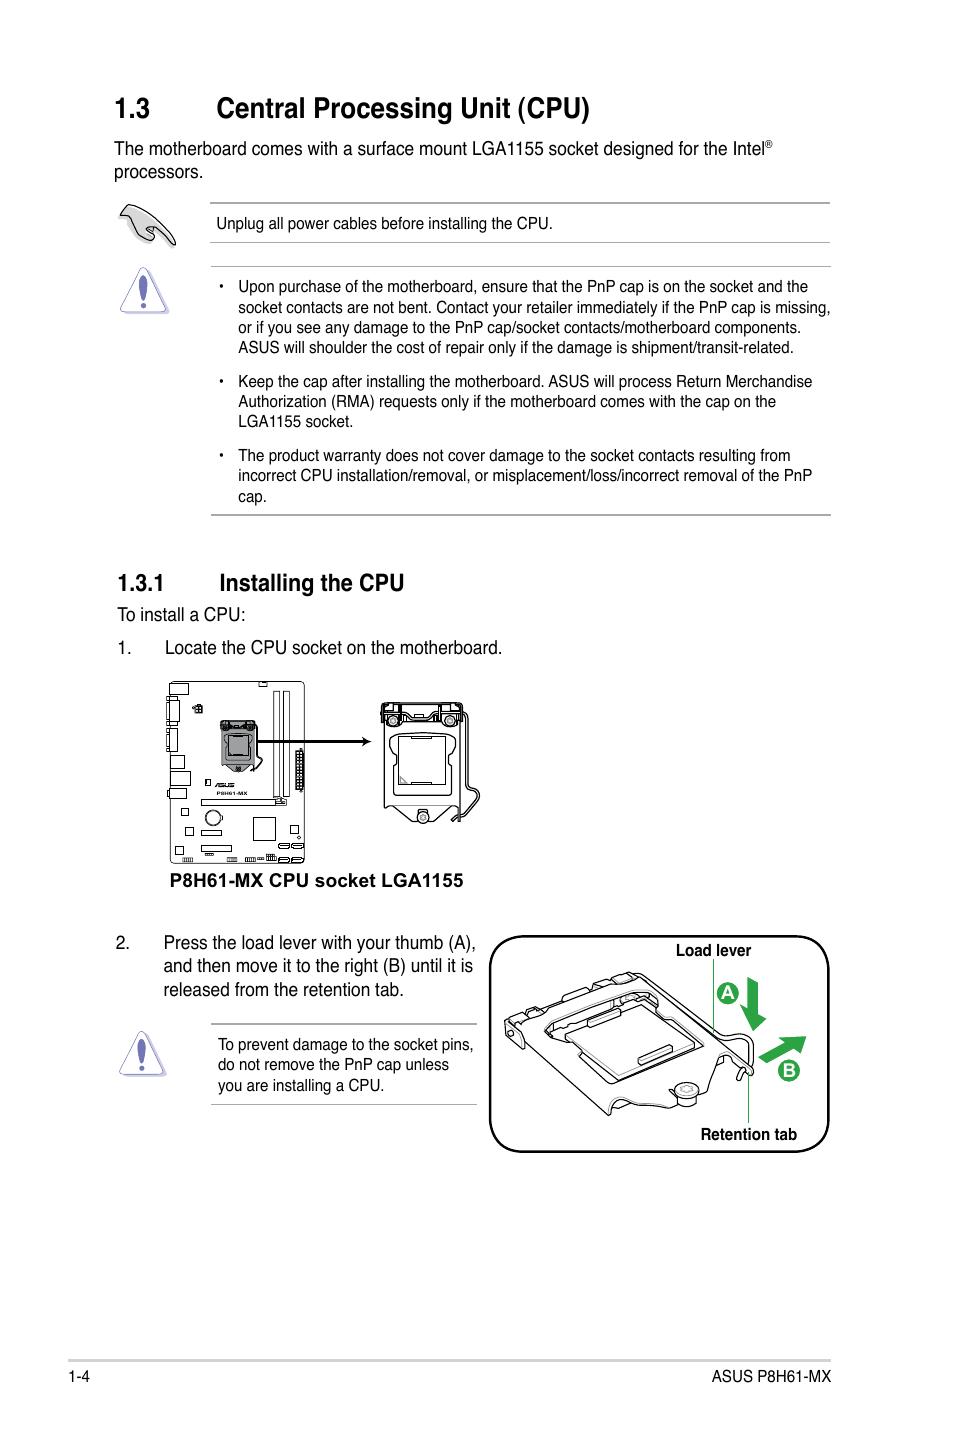 3 Central Processing Unit  Cpu   1 Installing The Cpu